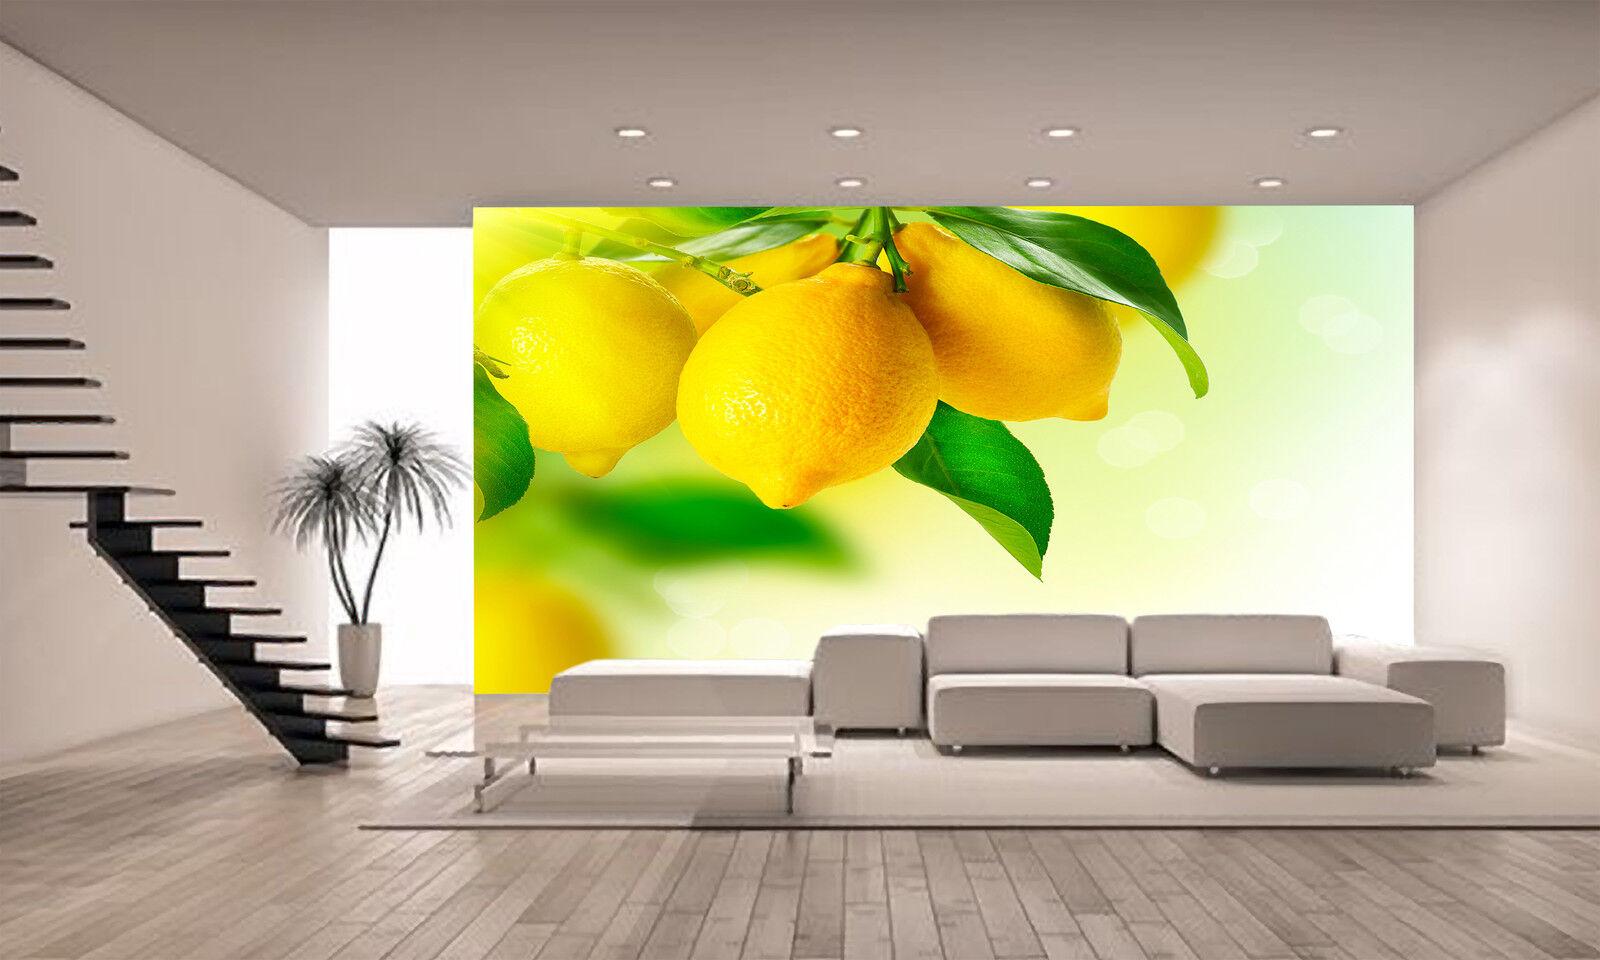 Lemon tree Wall Mural Photo Wallpaper POSTER GIANT WALL DECOR Free Glue Bedroom